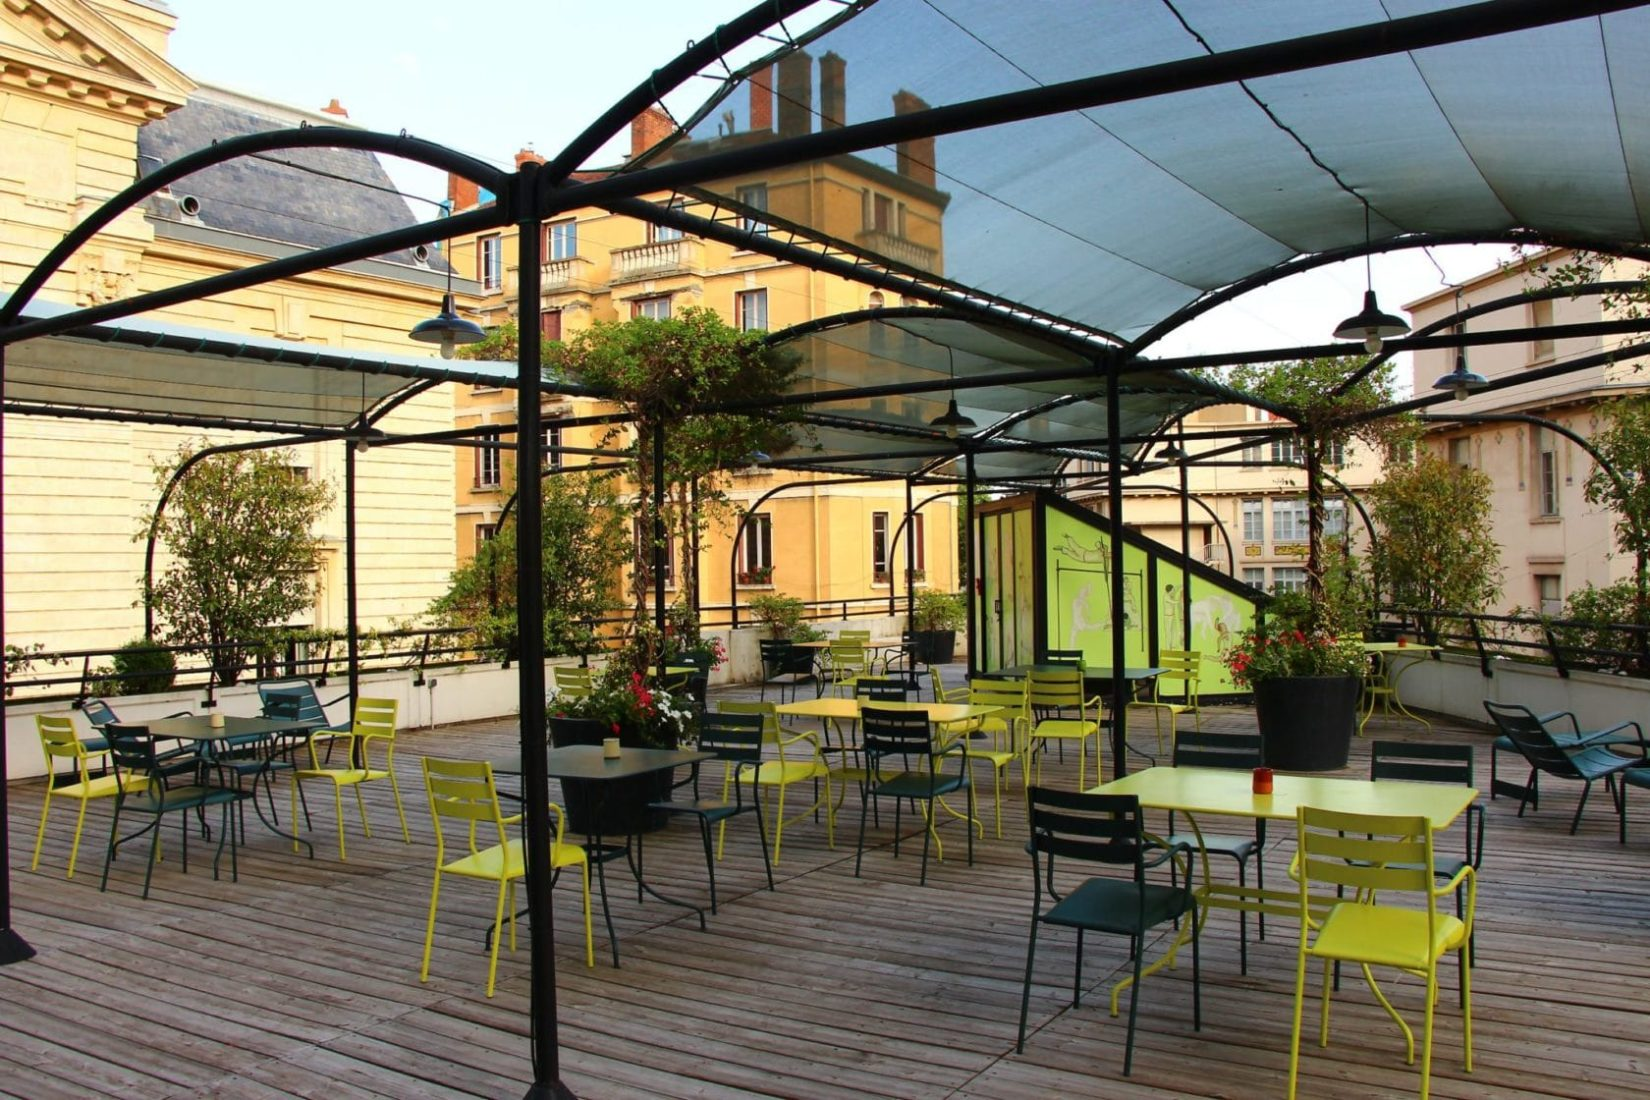 College-Hotel Cuisine clandestine 5 chefs sur un rooftop